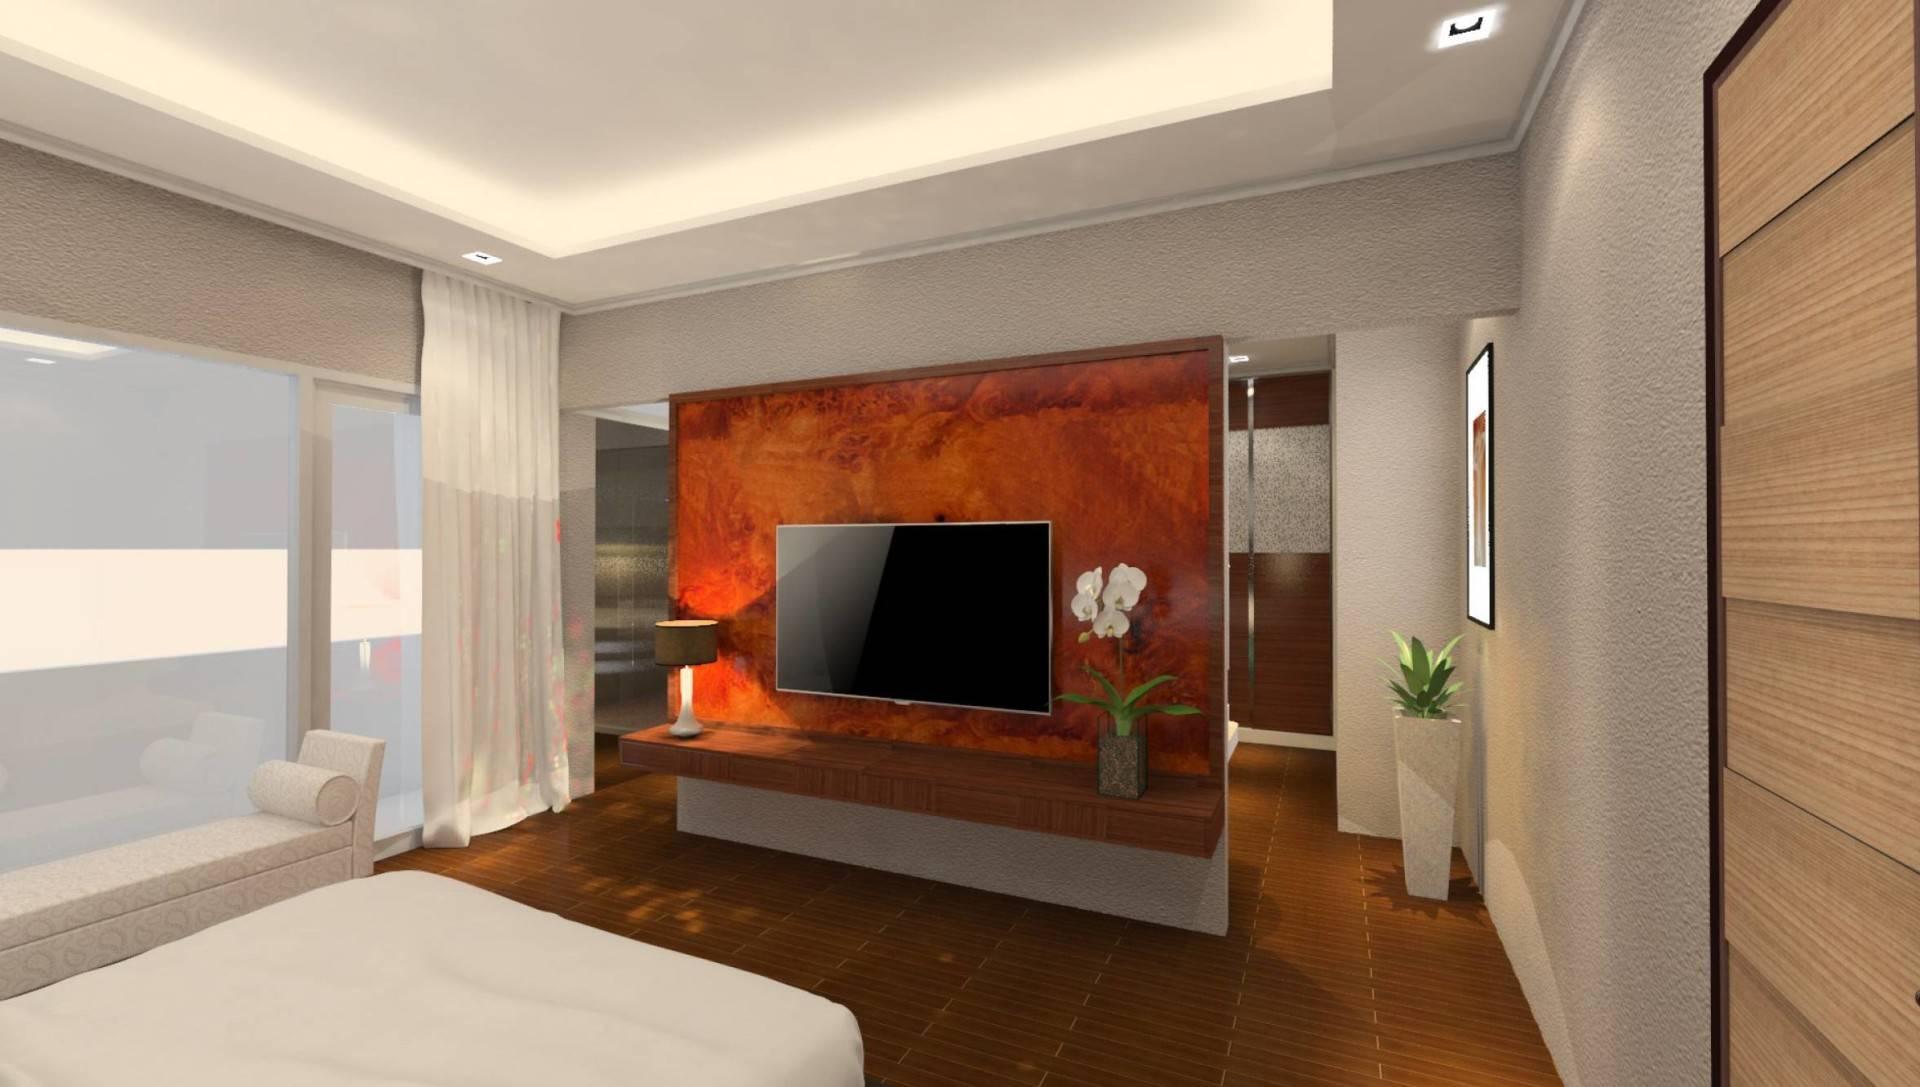 Chai Twin Co Residence At Sui Raya Dalam Pontianak, West Kalimantan Pontianak, West Kalimantan Bedroom   2371